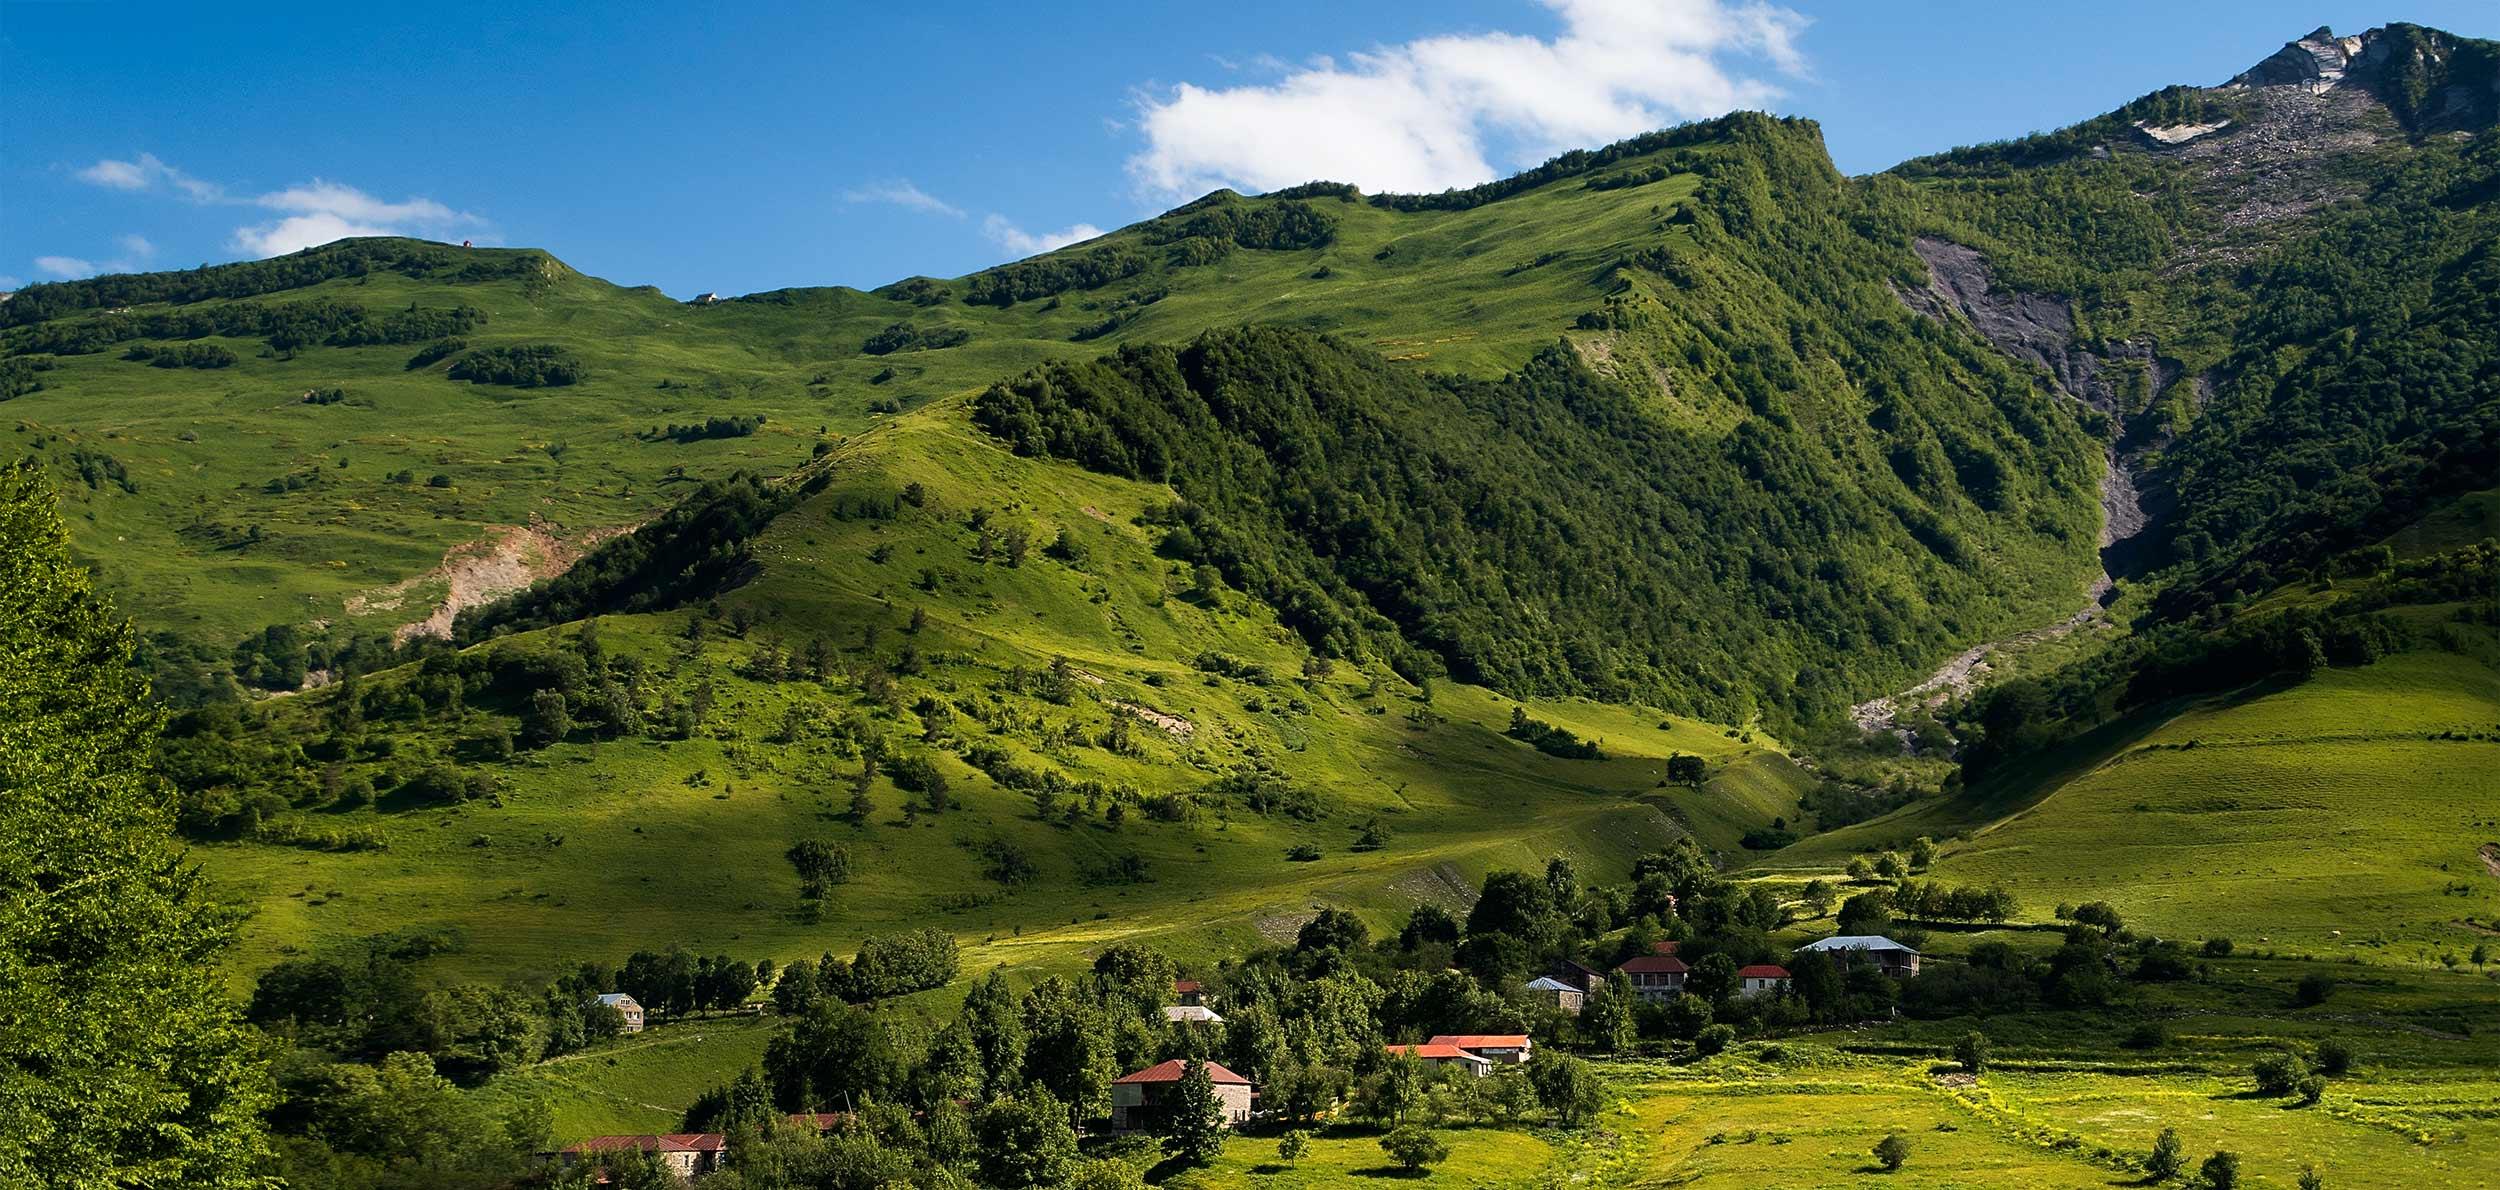 Горы-Отдых-Путешествия-Грузия-NAMERANI.jpg